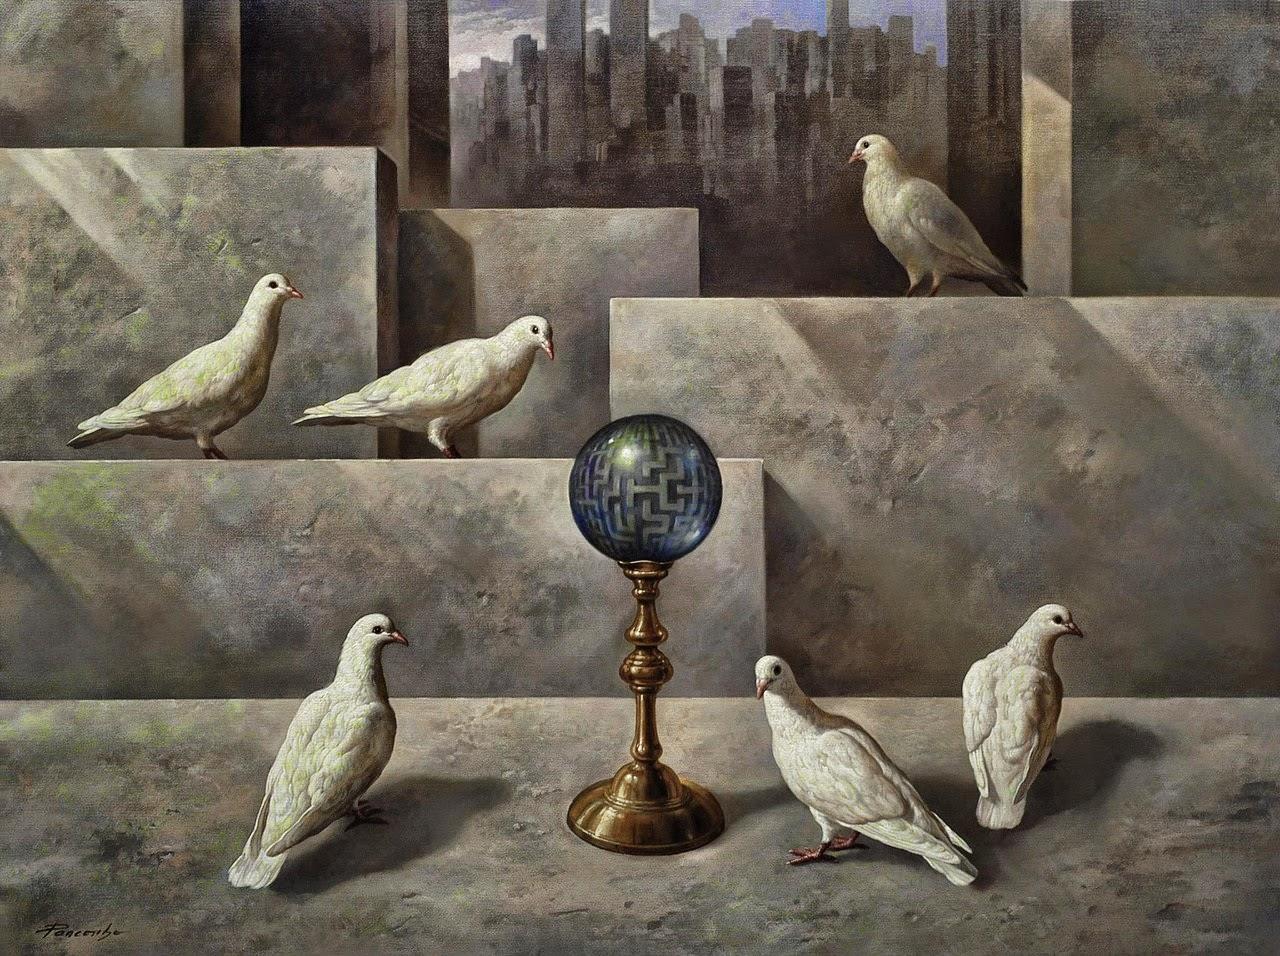 Фантастический реализм художника Альберто Панкорбо 76